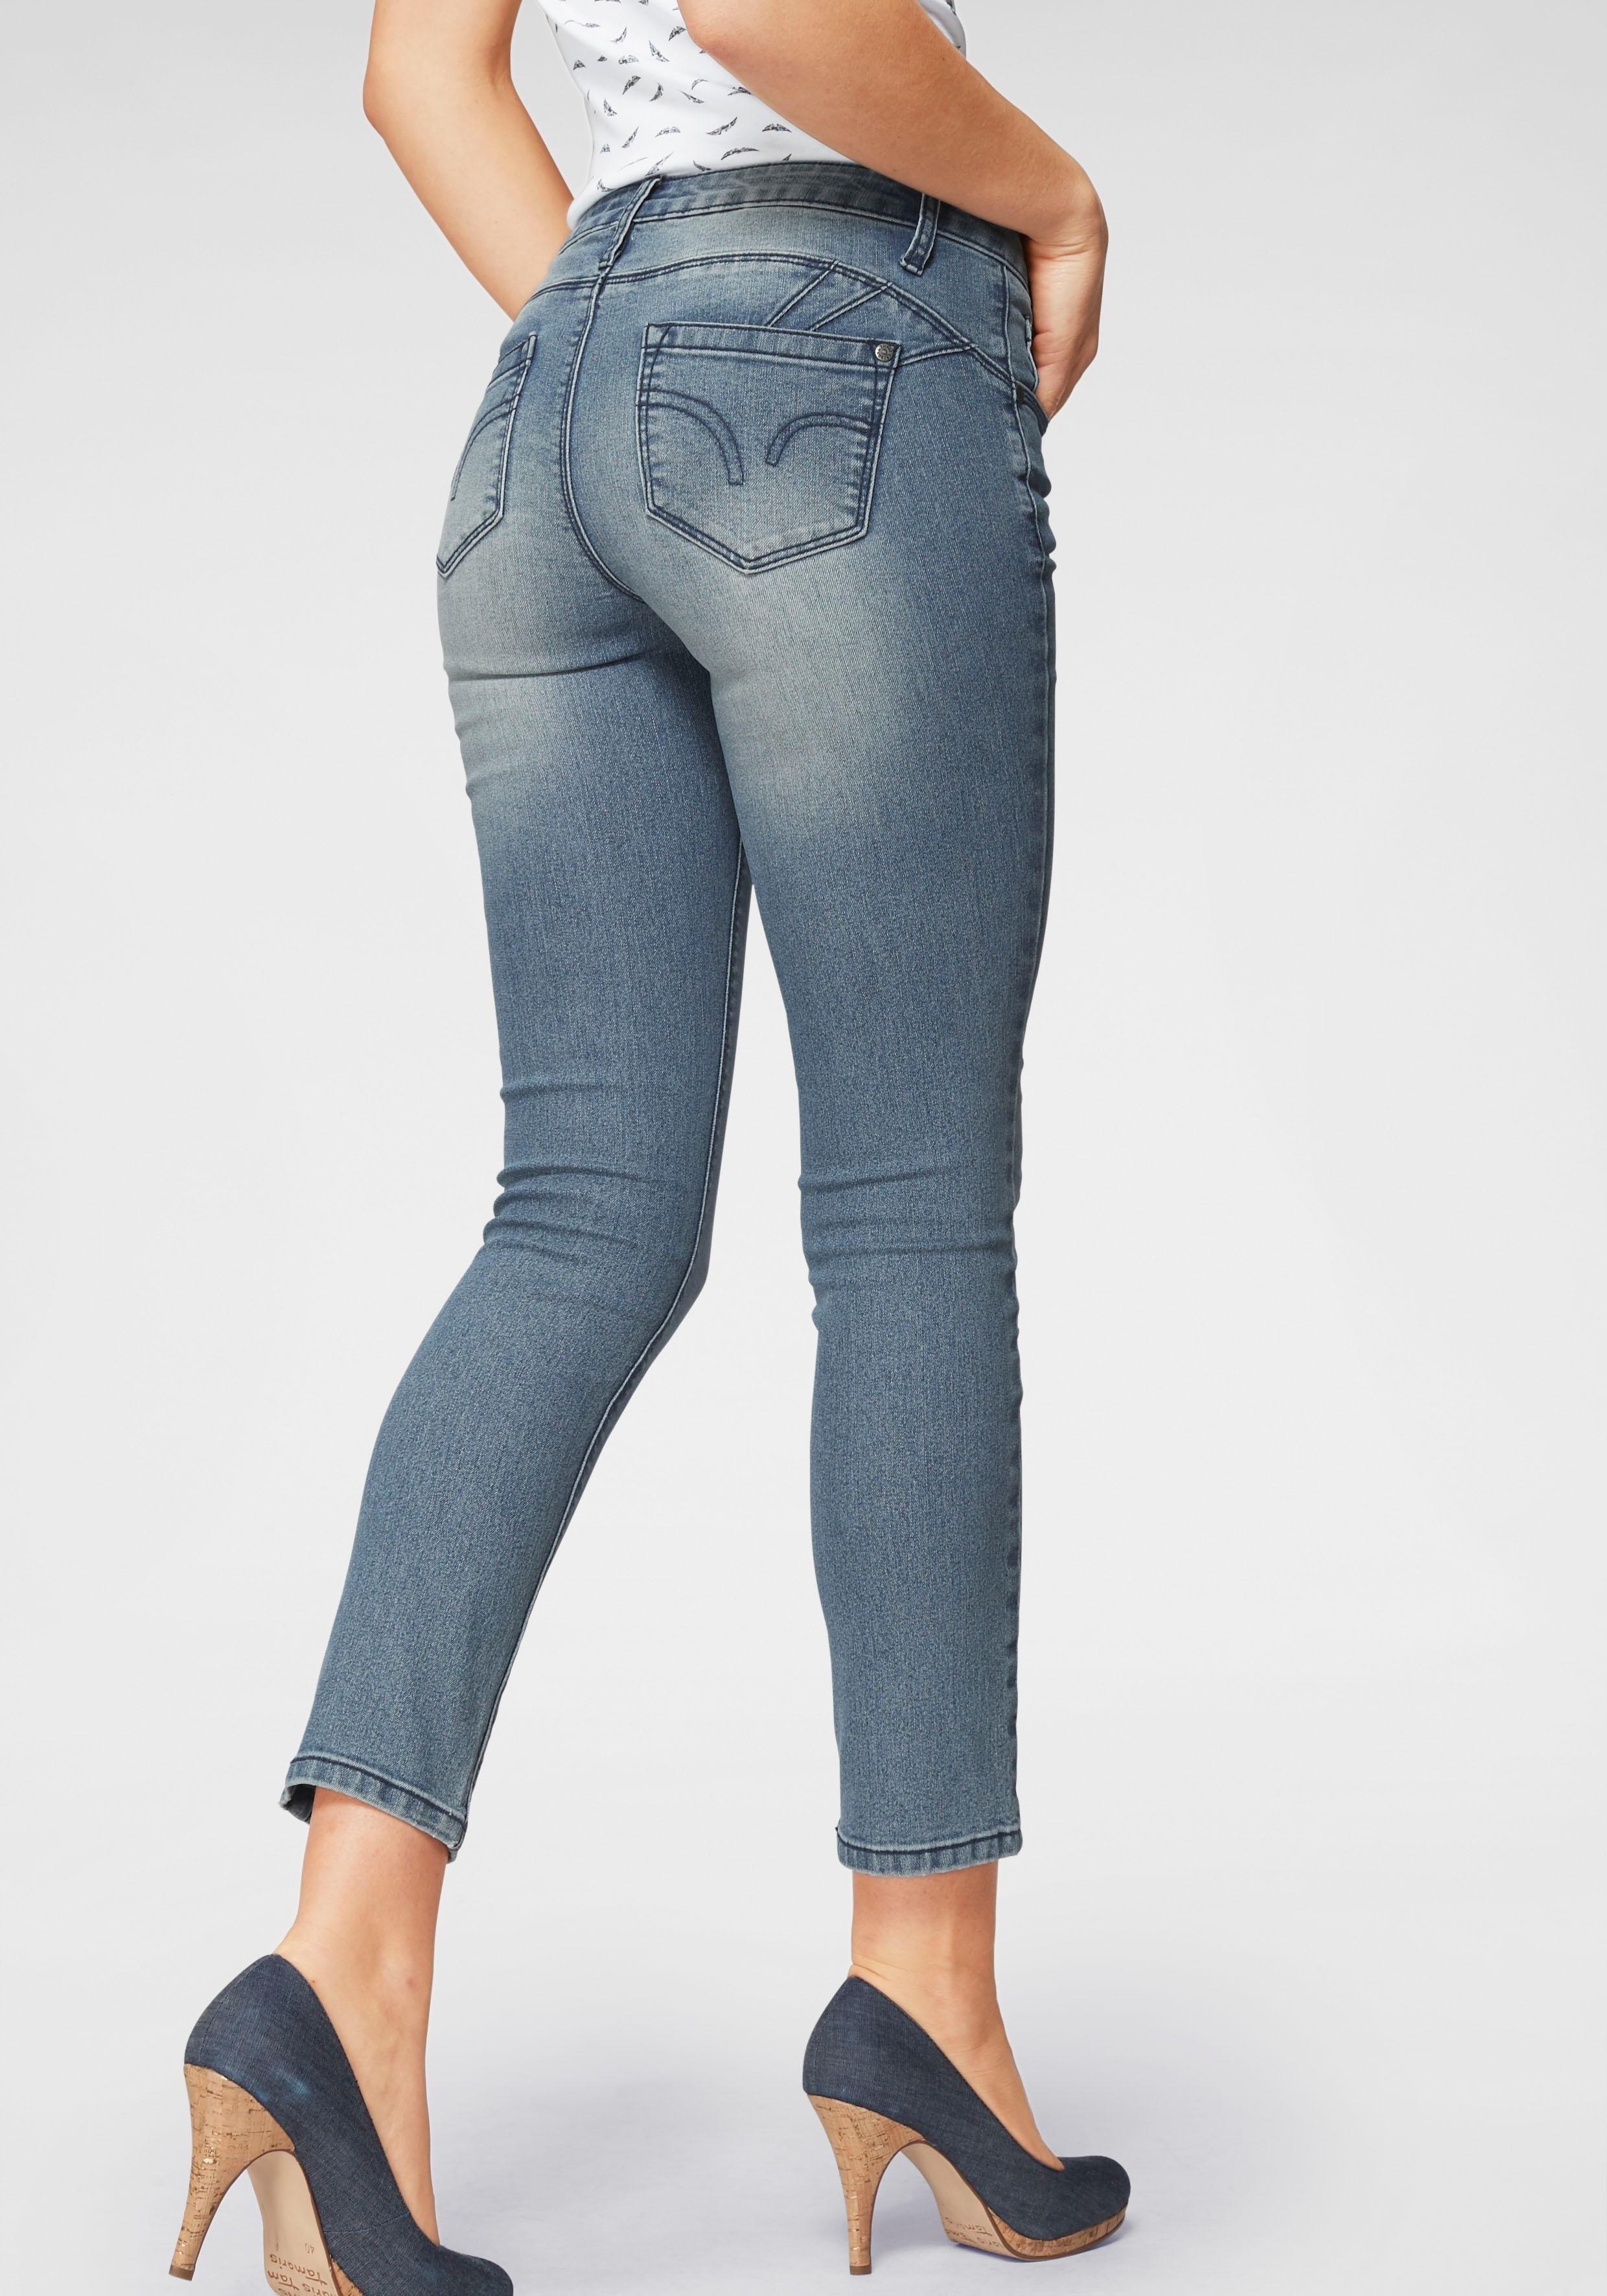 ARIZONA 7/8 jeans »Shaping« online kopen op otto.nl